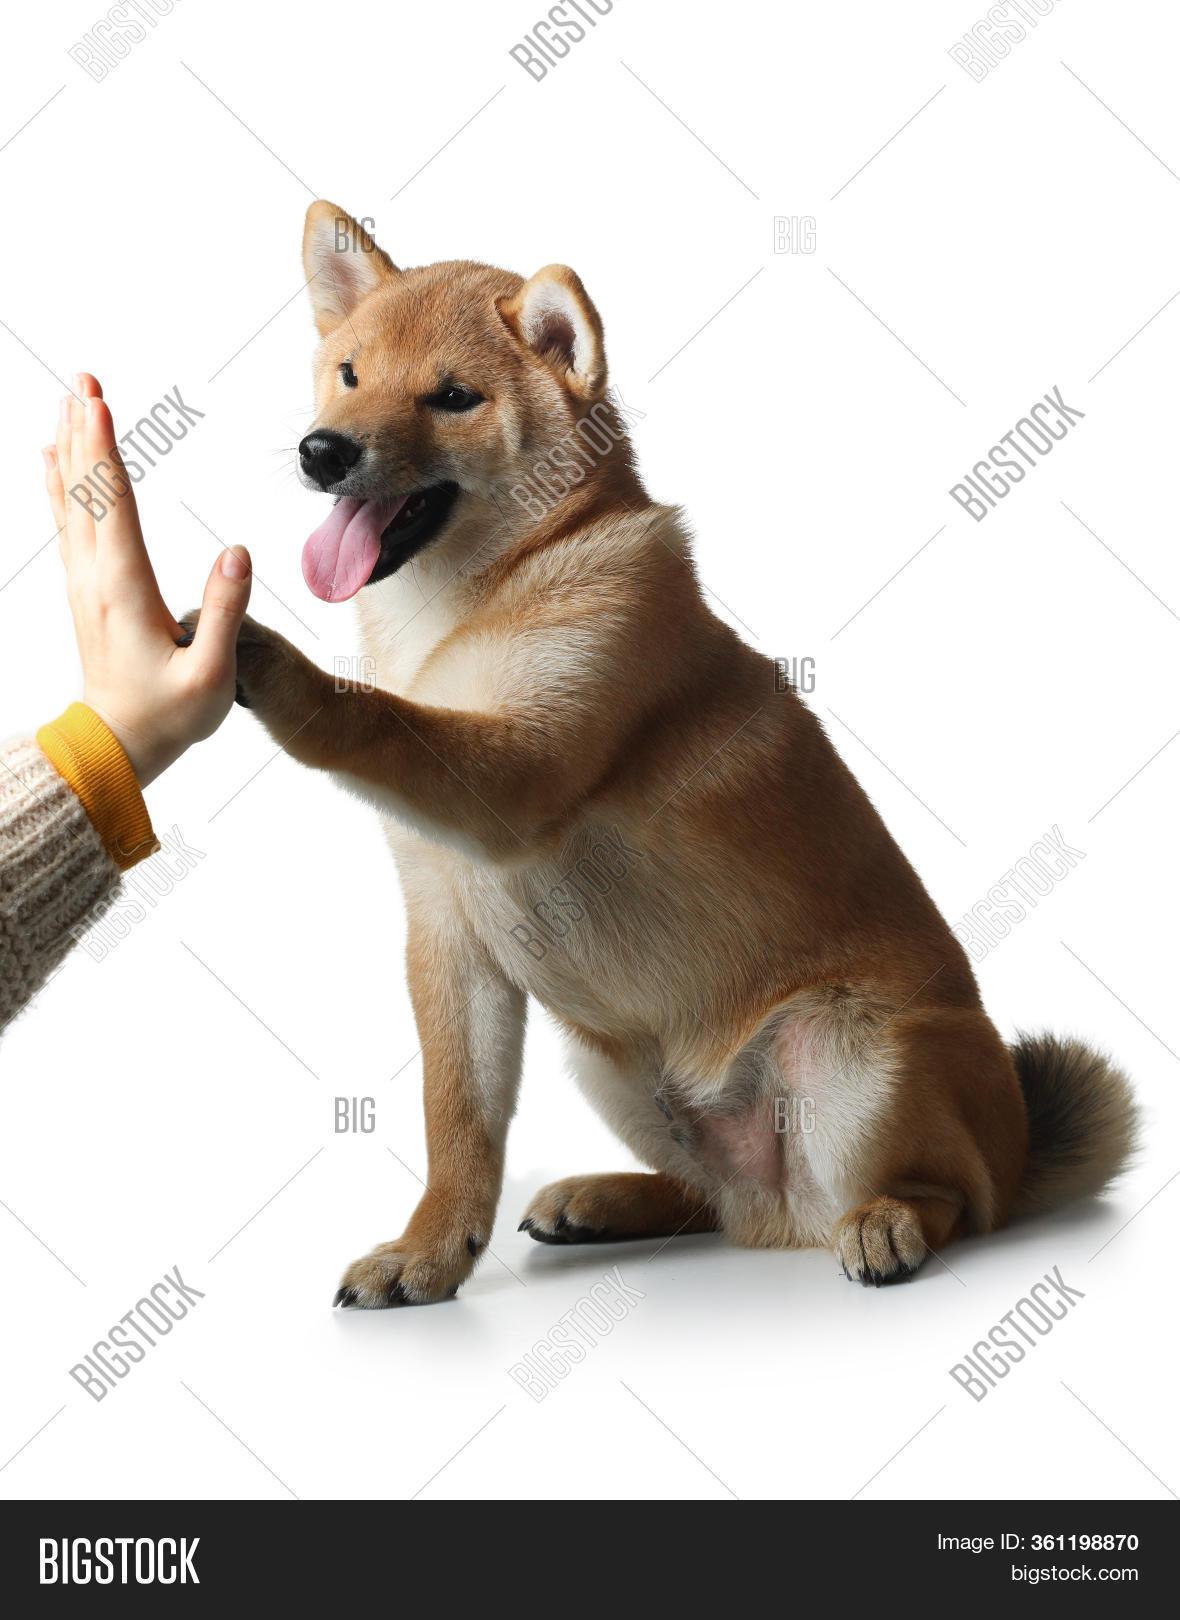 Shiba Inu Puppy Dog Image Photo Free Trial Bigstock